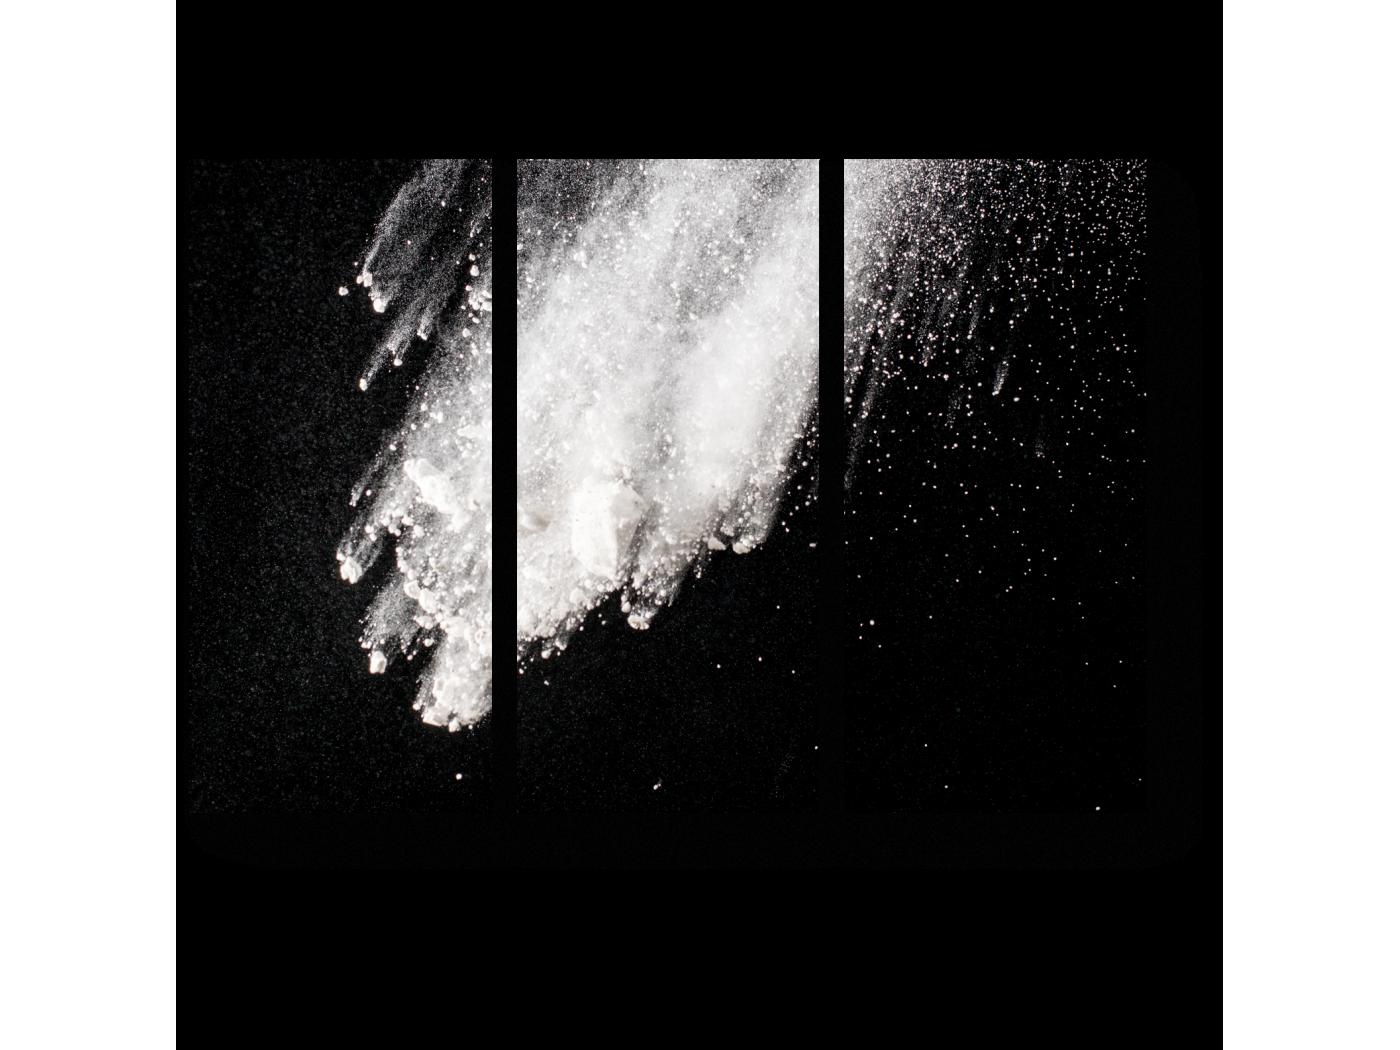 Модульная картина Взрыв (60x43) фото